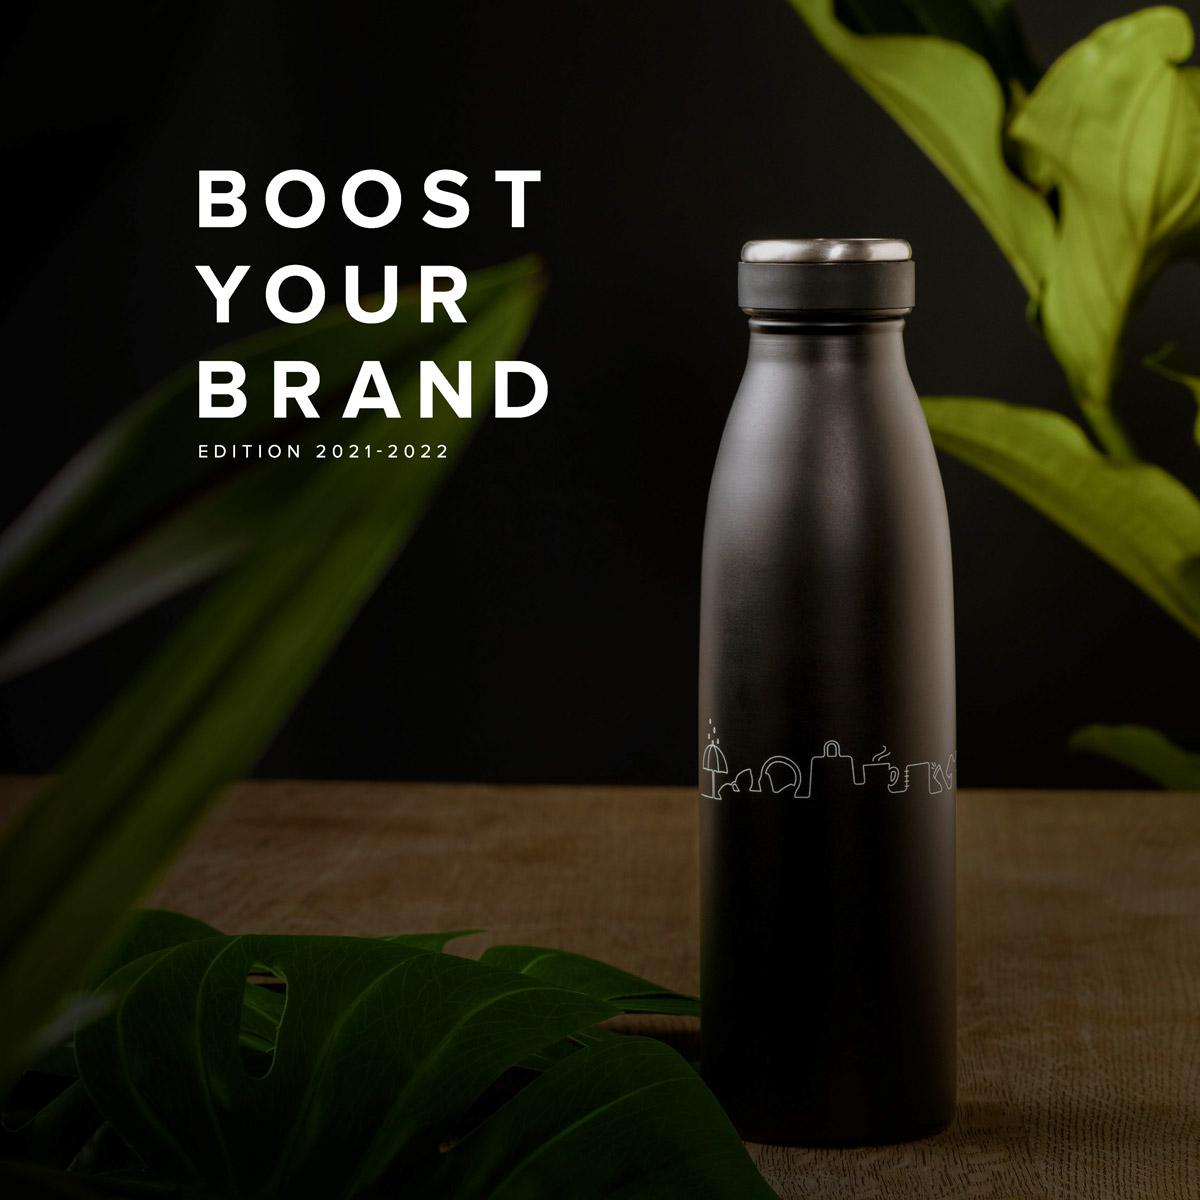 Kall Kwik WGC - Boost your brand